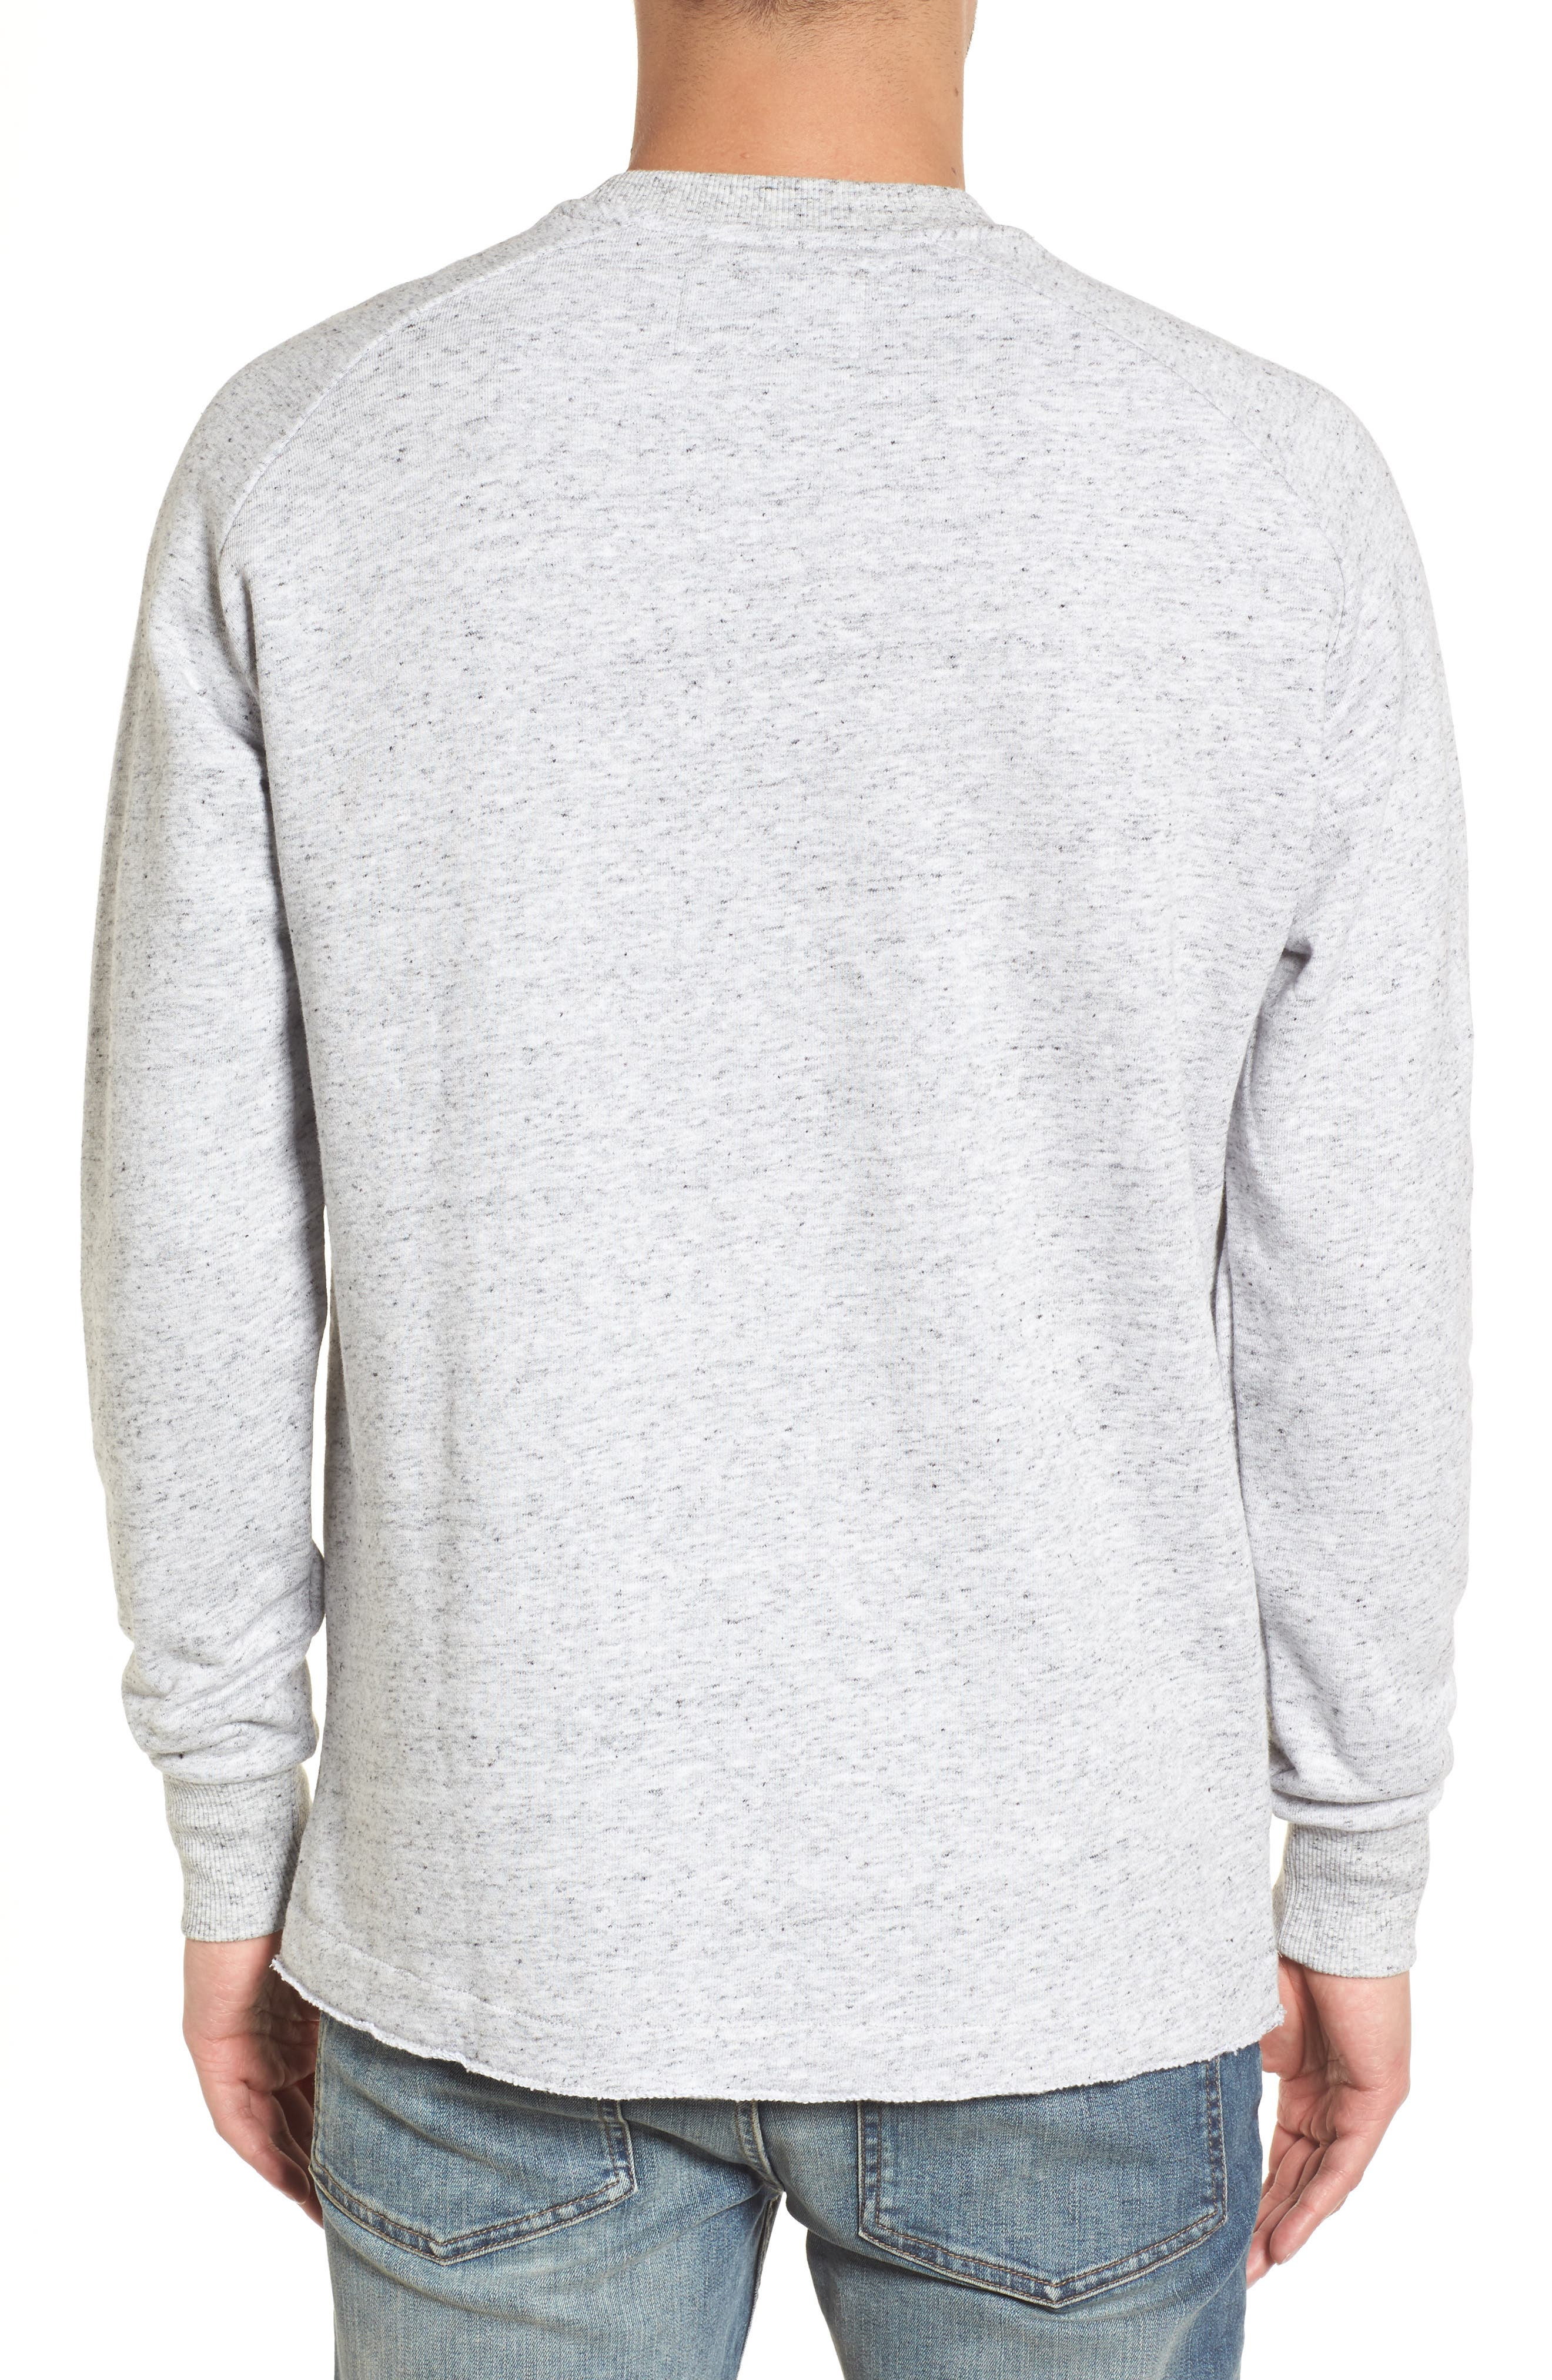 Torn Crew Sweatshirt,                             Alternate thumbnail 2, color,                             059